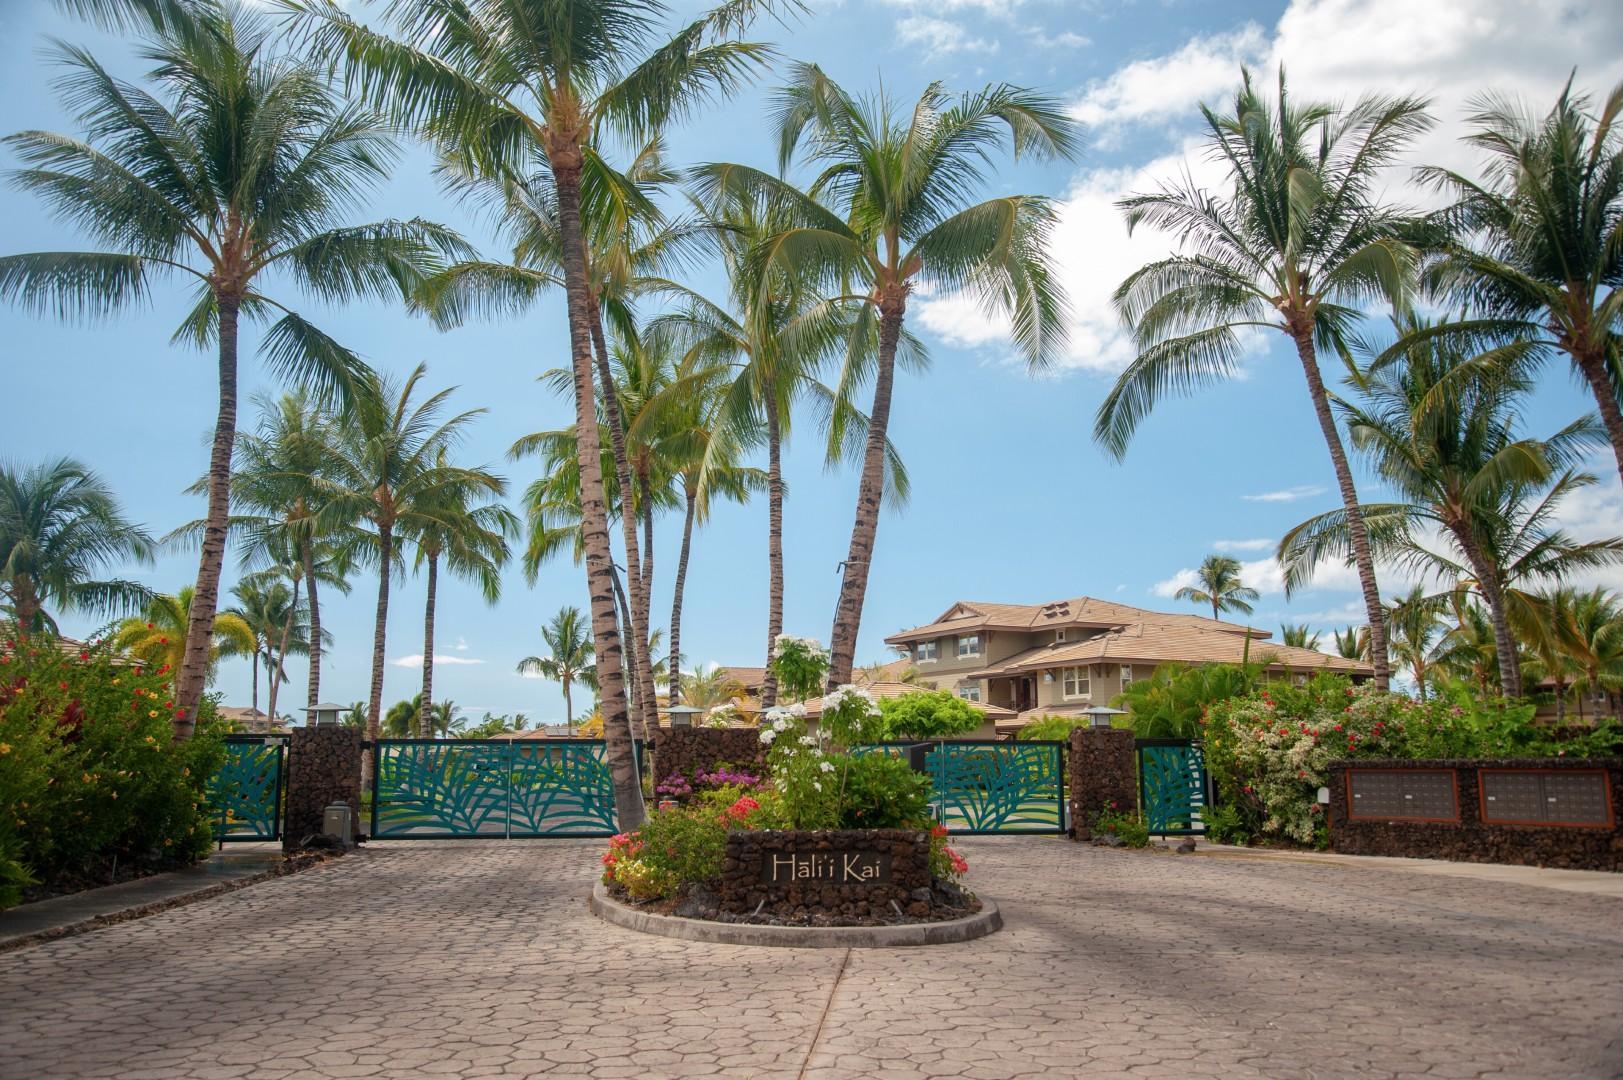 Hali'i Kai Resort's private & gated entrance